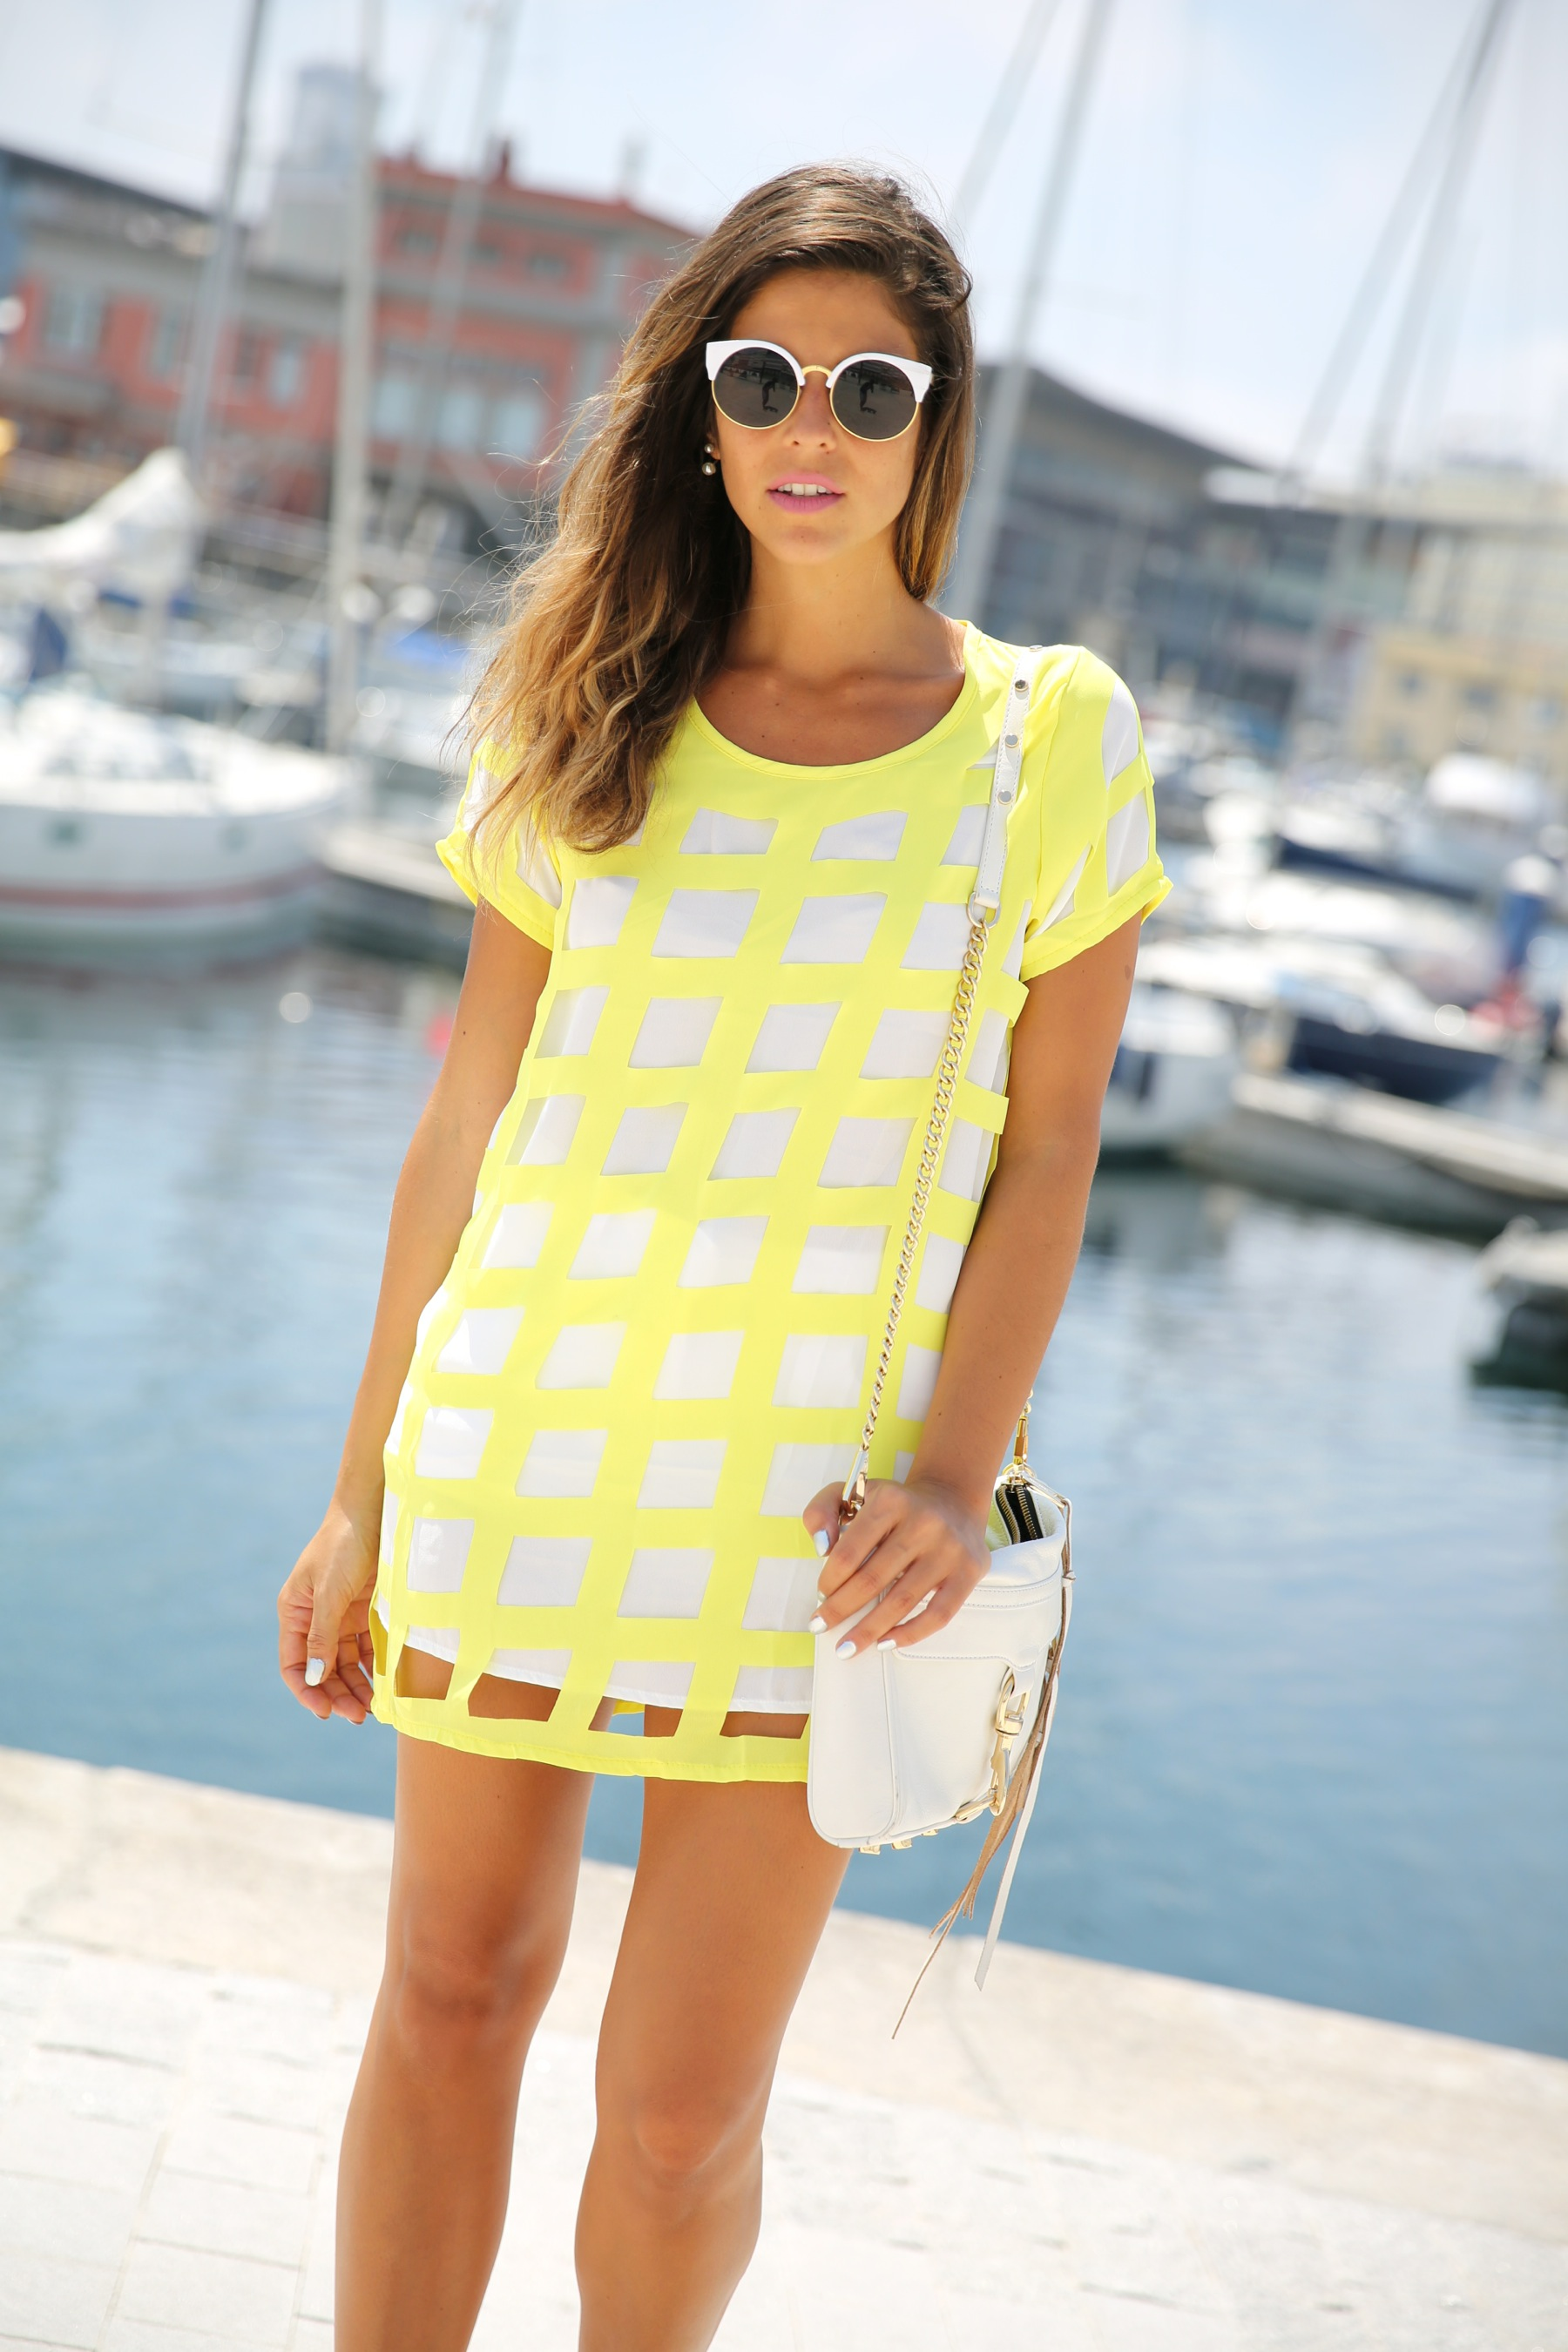 trendy_taste-look-outfit-street_style-ootd-blog-blogger-moda_españa-fashion_spain-coruña-galicia-sandalias_plataforma-platform_sandals-rebecca_minkoff-yellow-amarillo-vestido-dress-plaid-cuadros-5